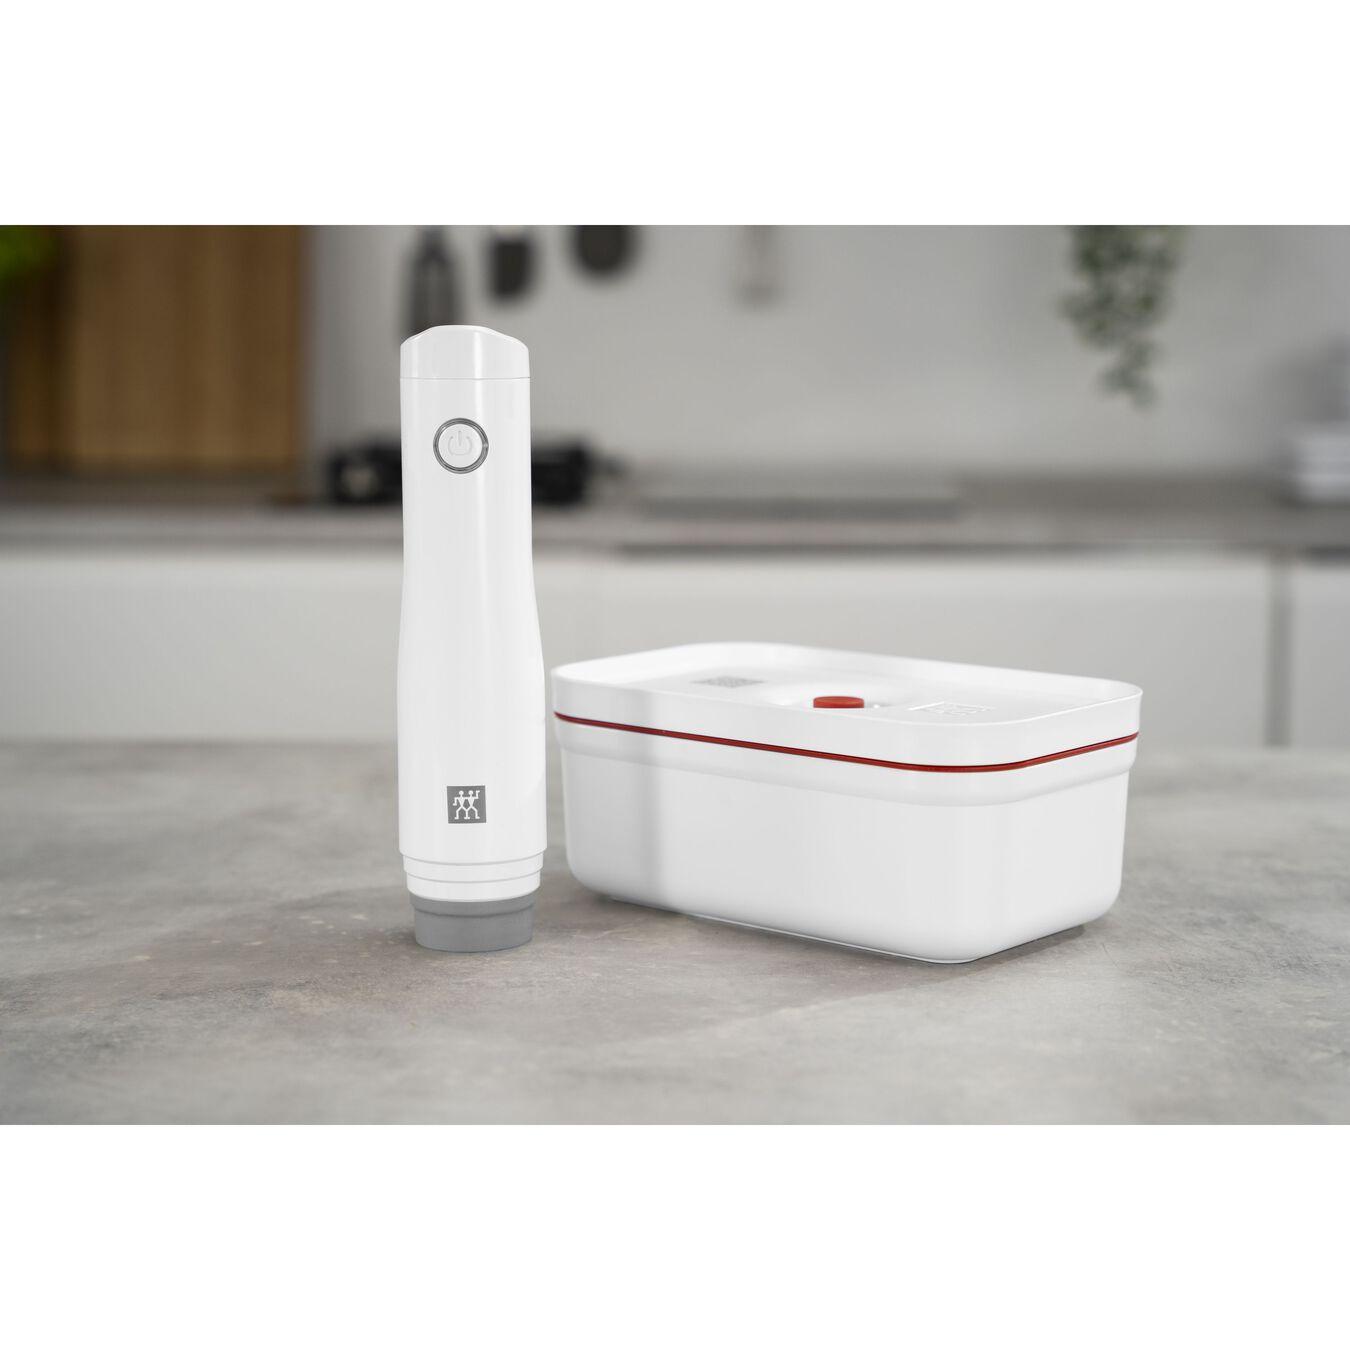 Vakuum Lunchbox, M, Kunststoff, Weiß-Rot,,large 6